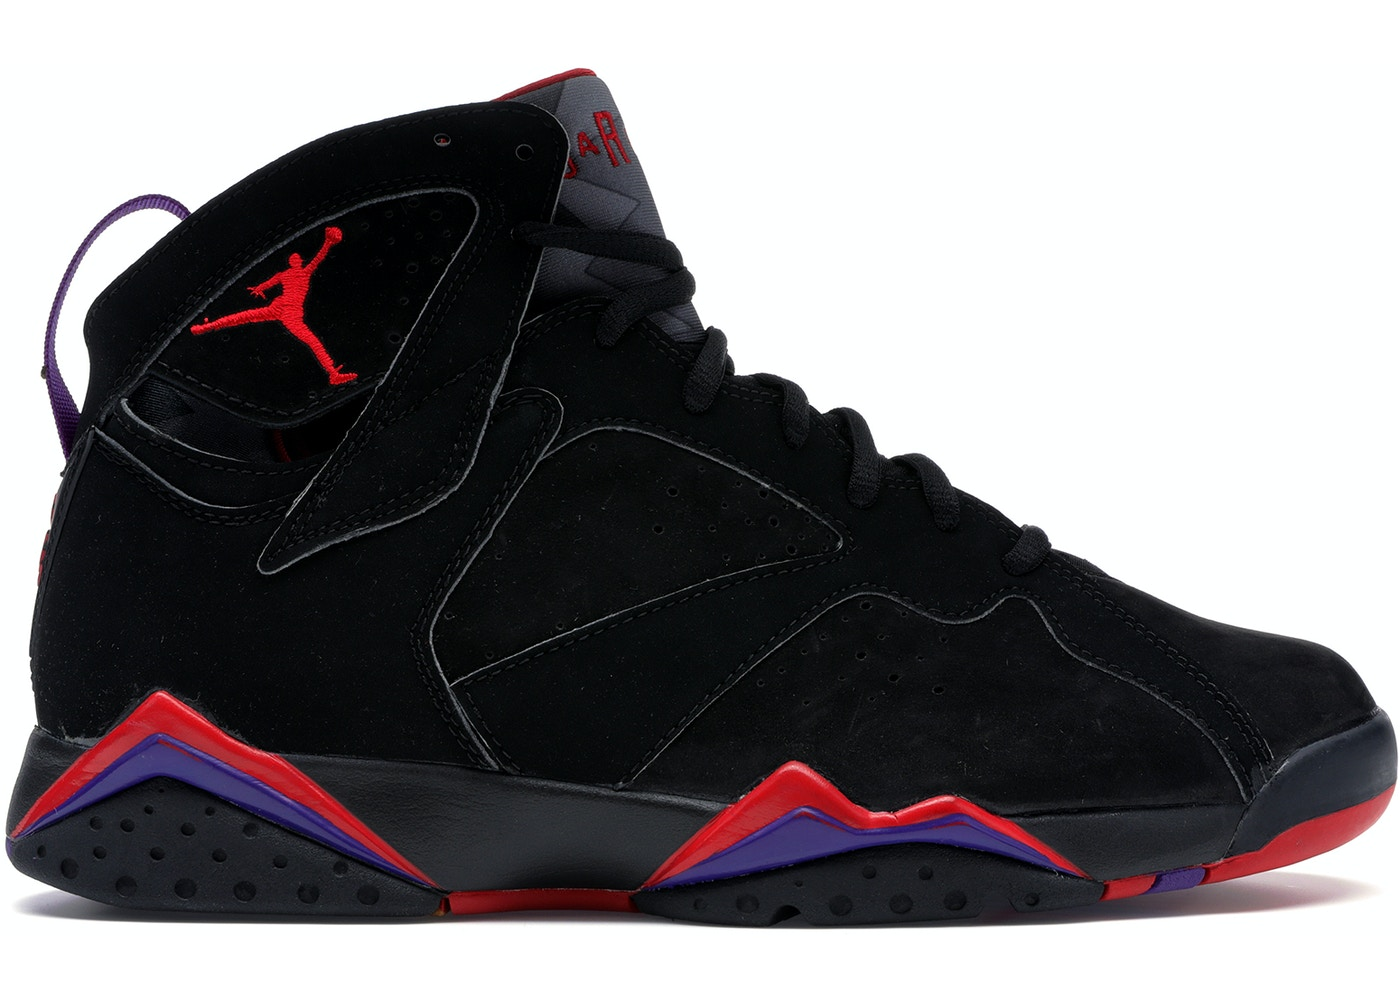 6f4cf6173cee Jordan 7 Retro Raptors (2002) - 304775-006